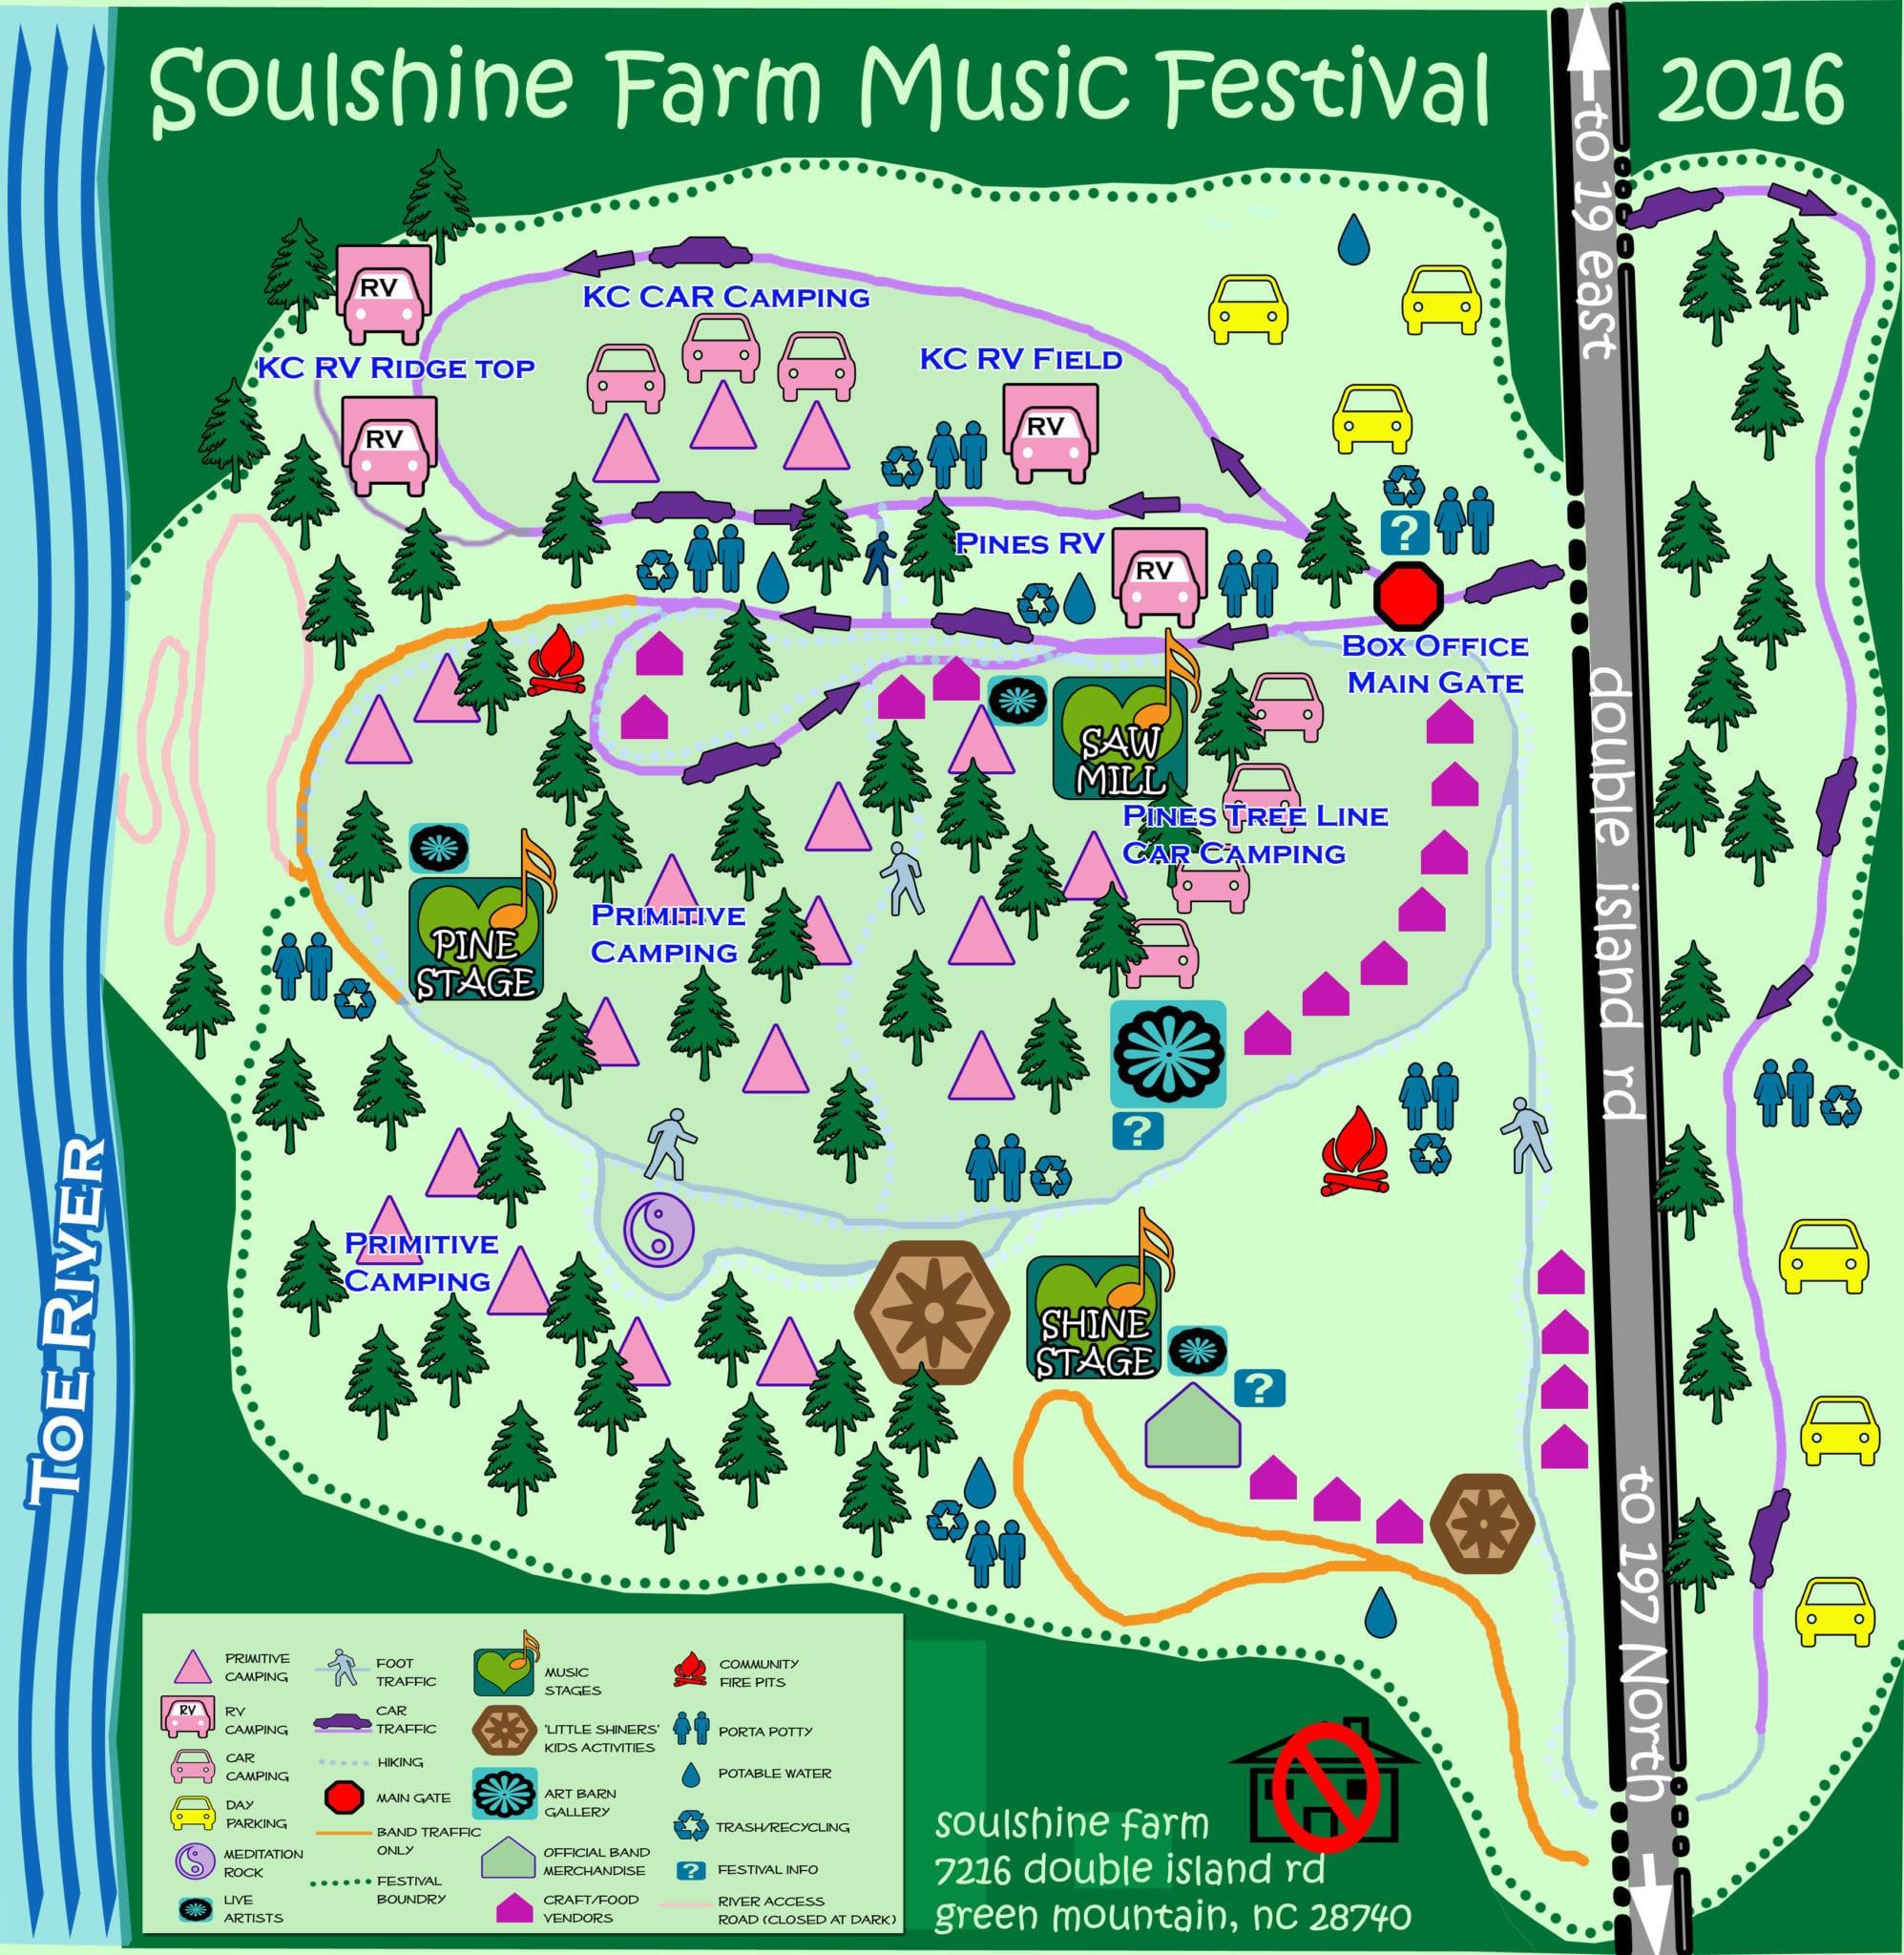 Gotta Let Your Soul Shine... at Soulshine Farm Music Festival ...